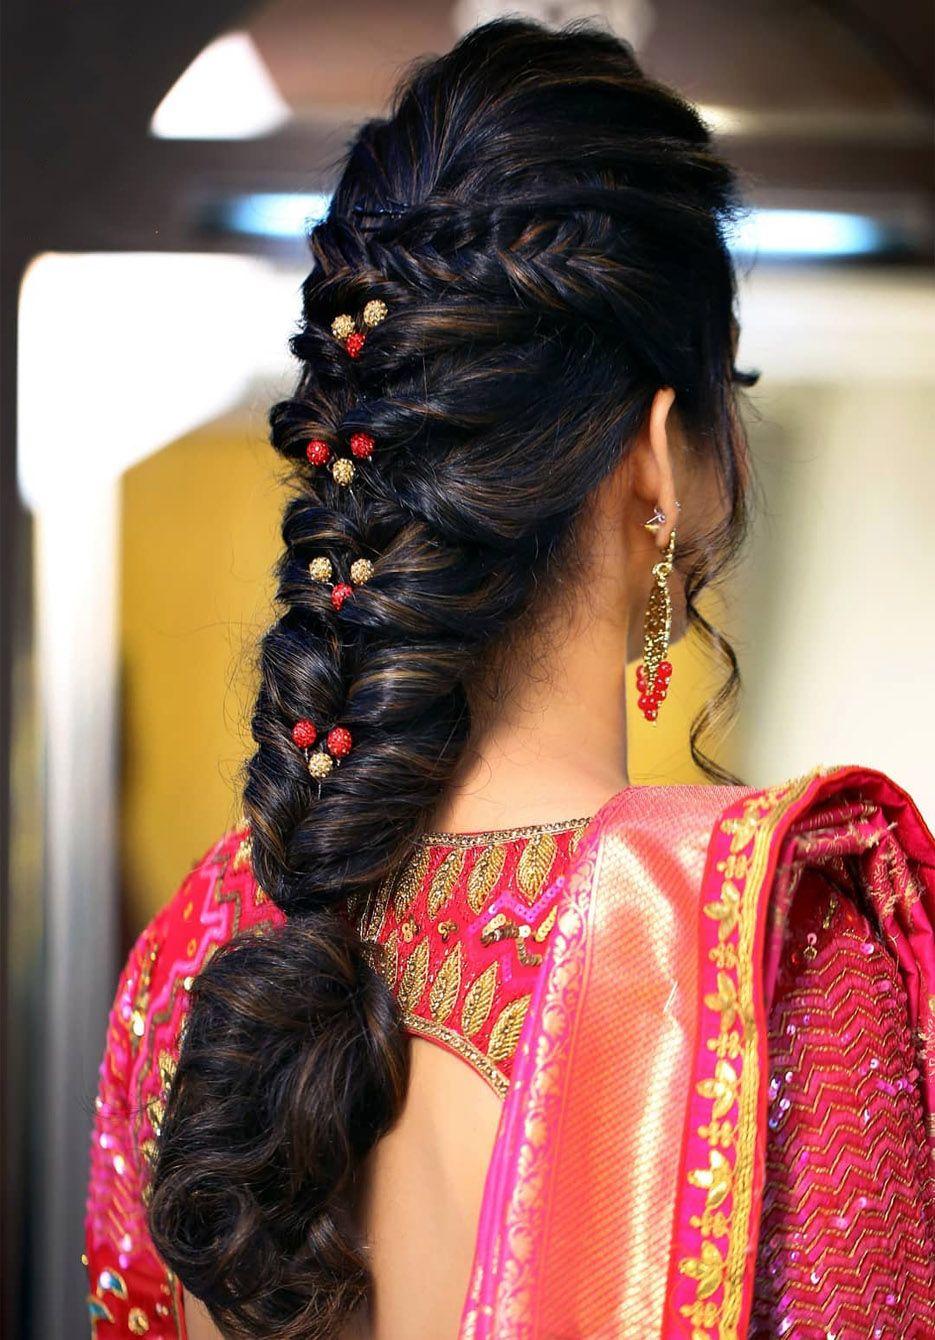 A Flowy Messy Fishtail Braid Hairstyles Ideas 2019 Braided Hairstyles For Wedding Fishtail Braid Hairstyles Messy Fishtail Braids